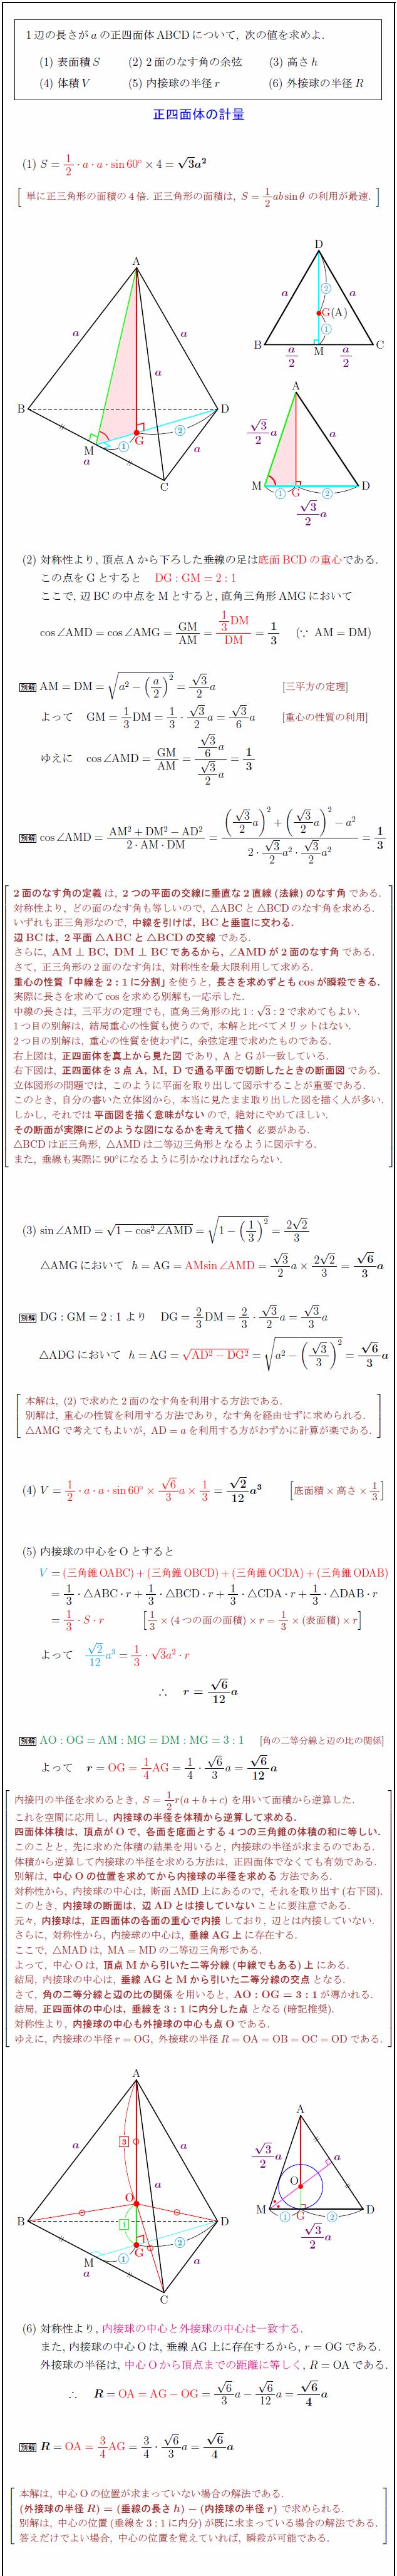 regular-tetrahedron